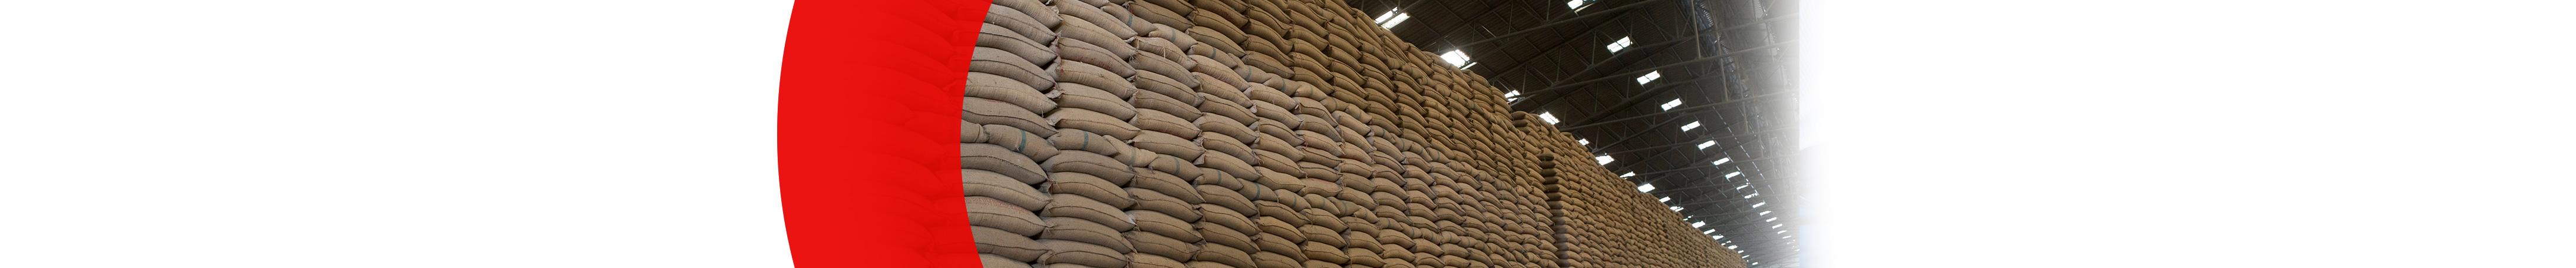 Rice Stockpile Scheme - E-Services | Enterprise Singapore